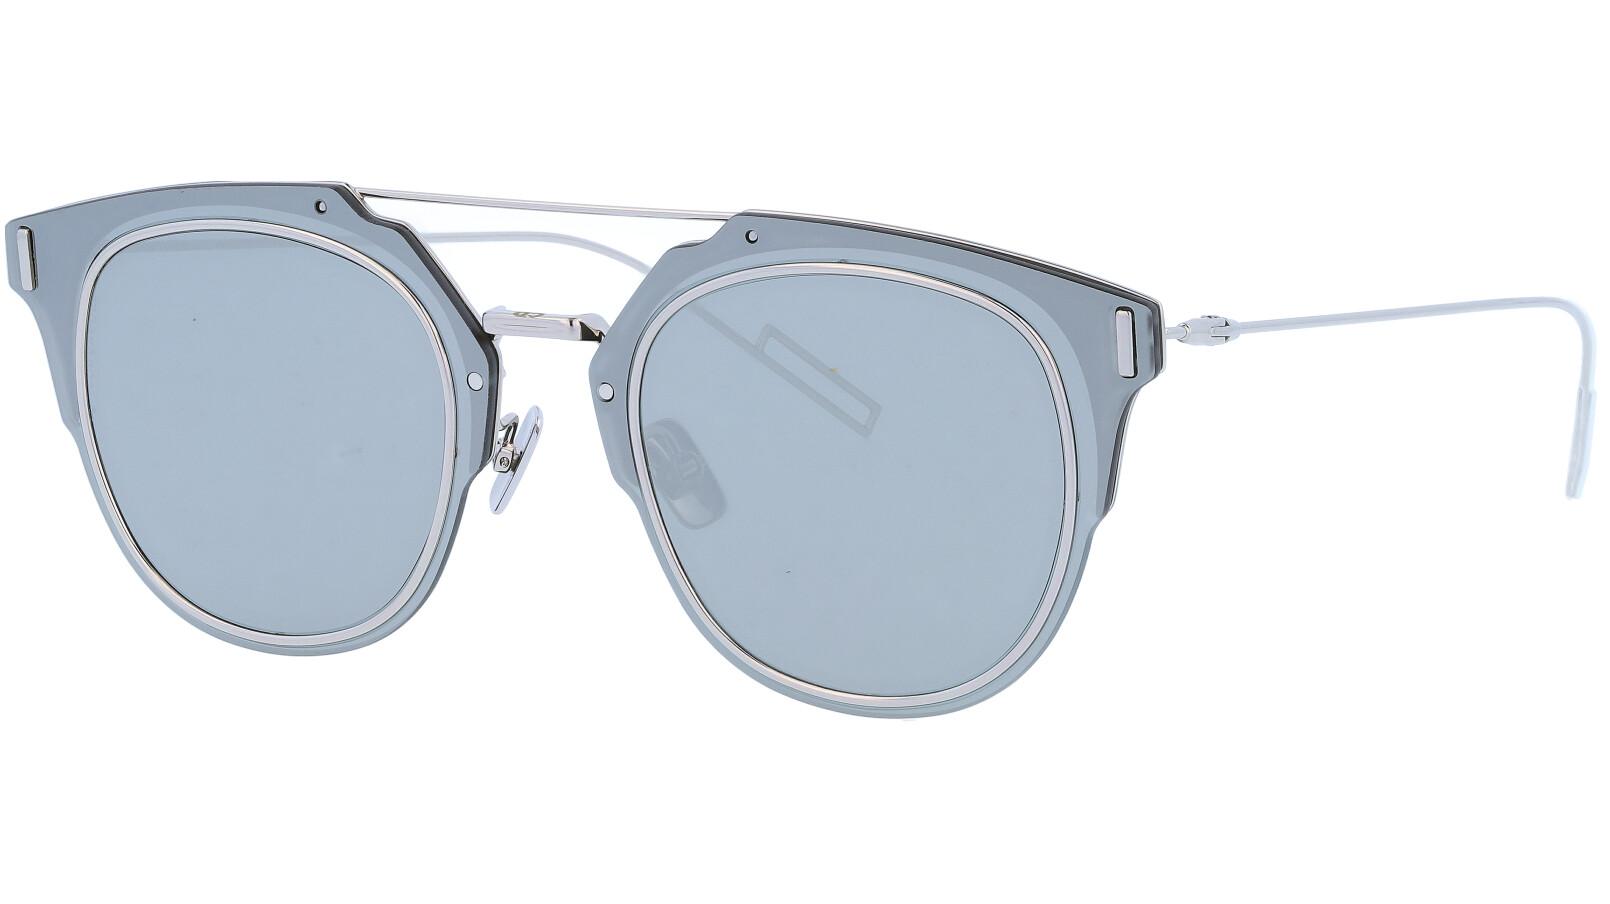 Dior COMPOSIT1.0 0062K 62 Black Sunglasses